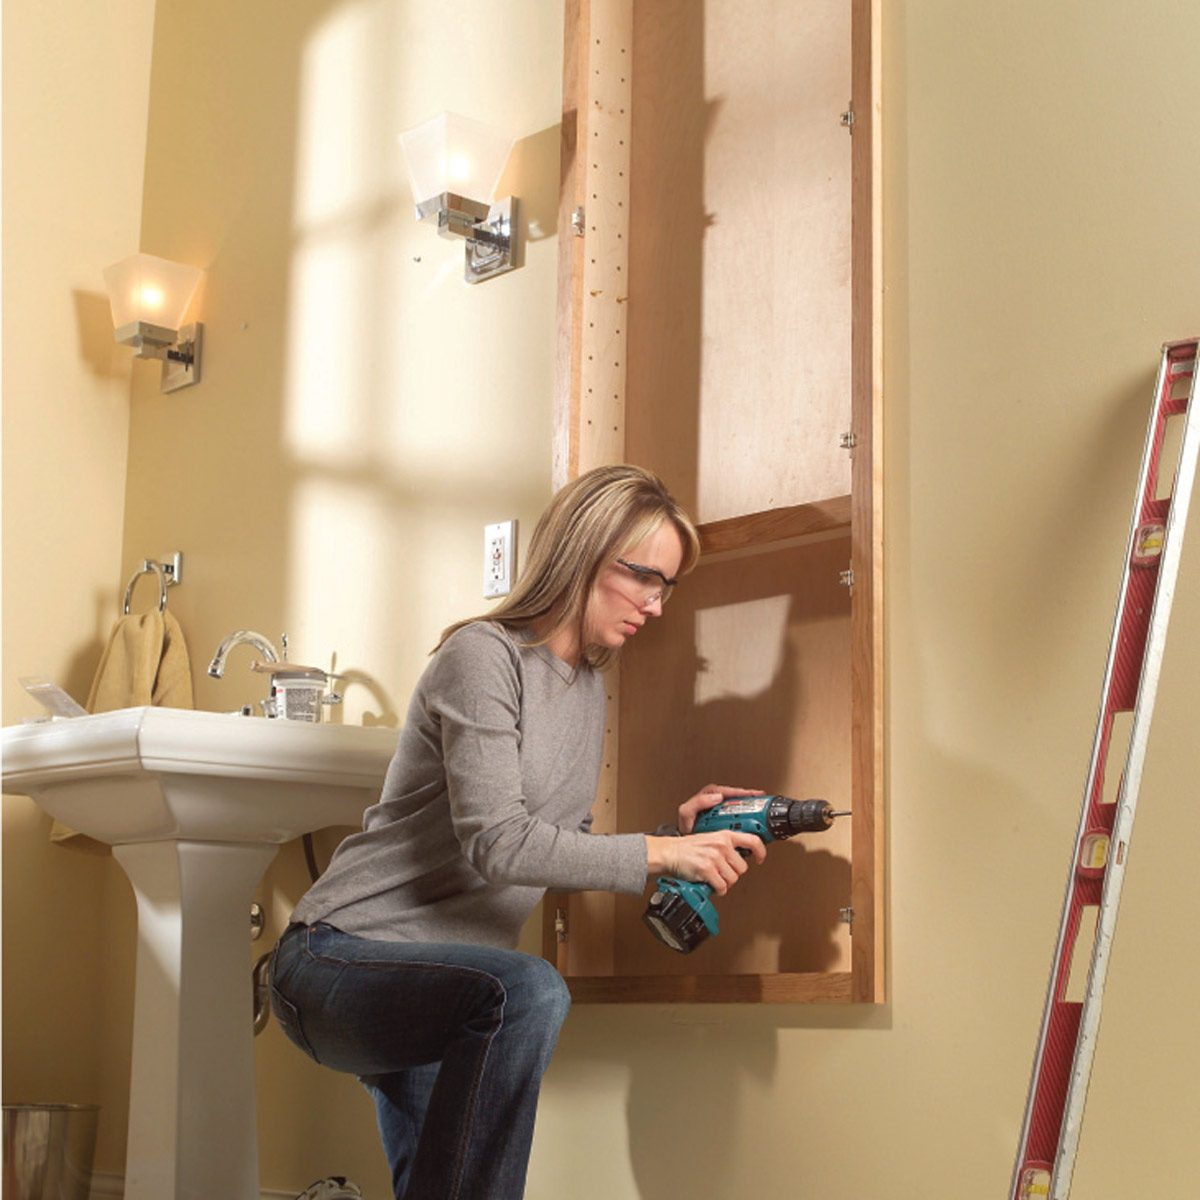 How To Build A Built In Bath Cabinet Diy Family Handyman